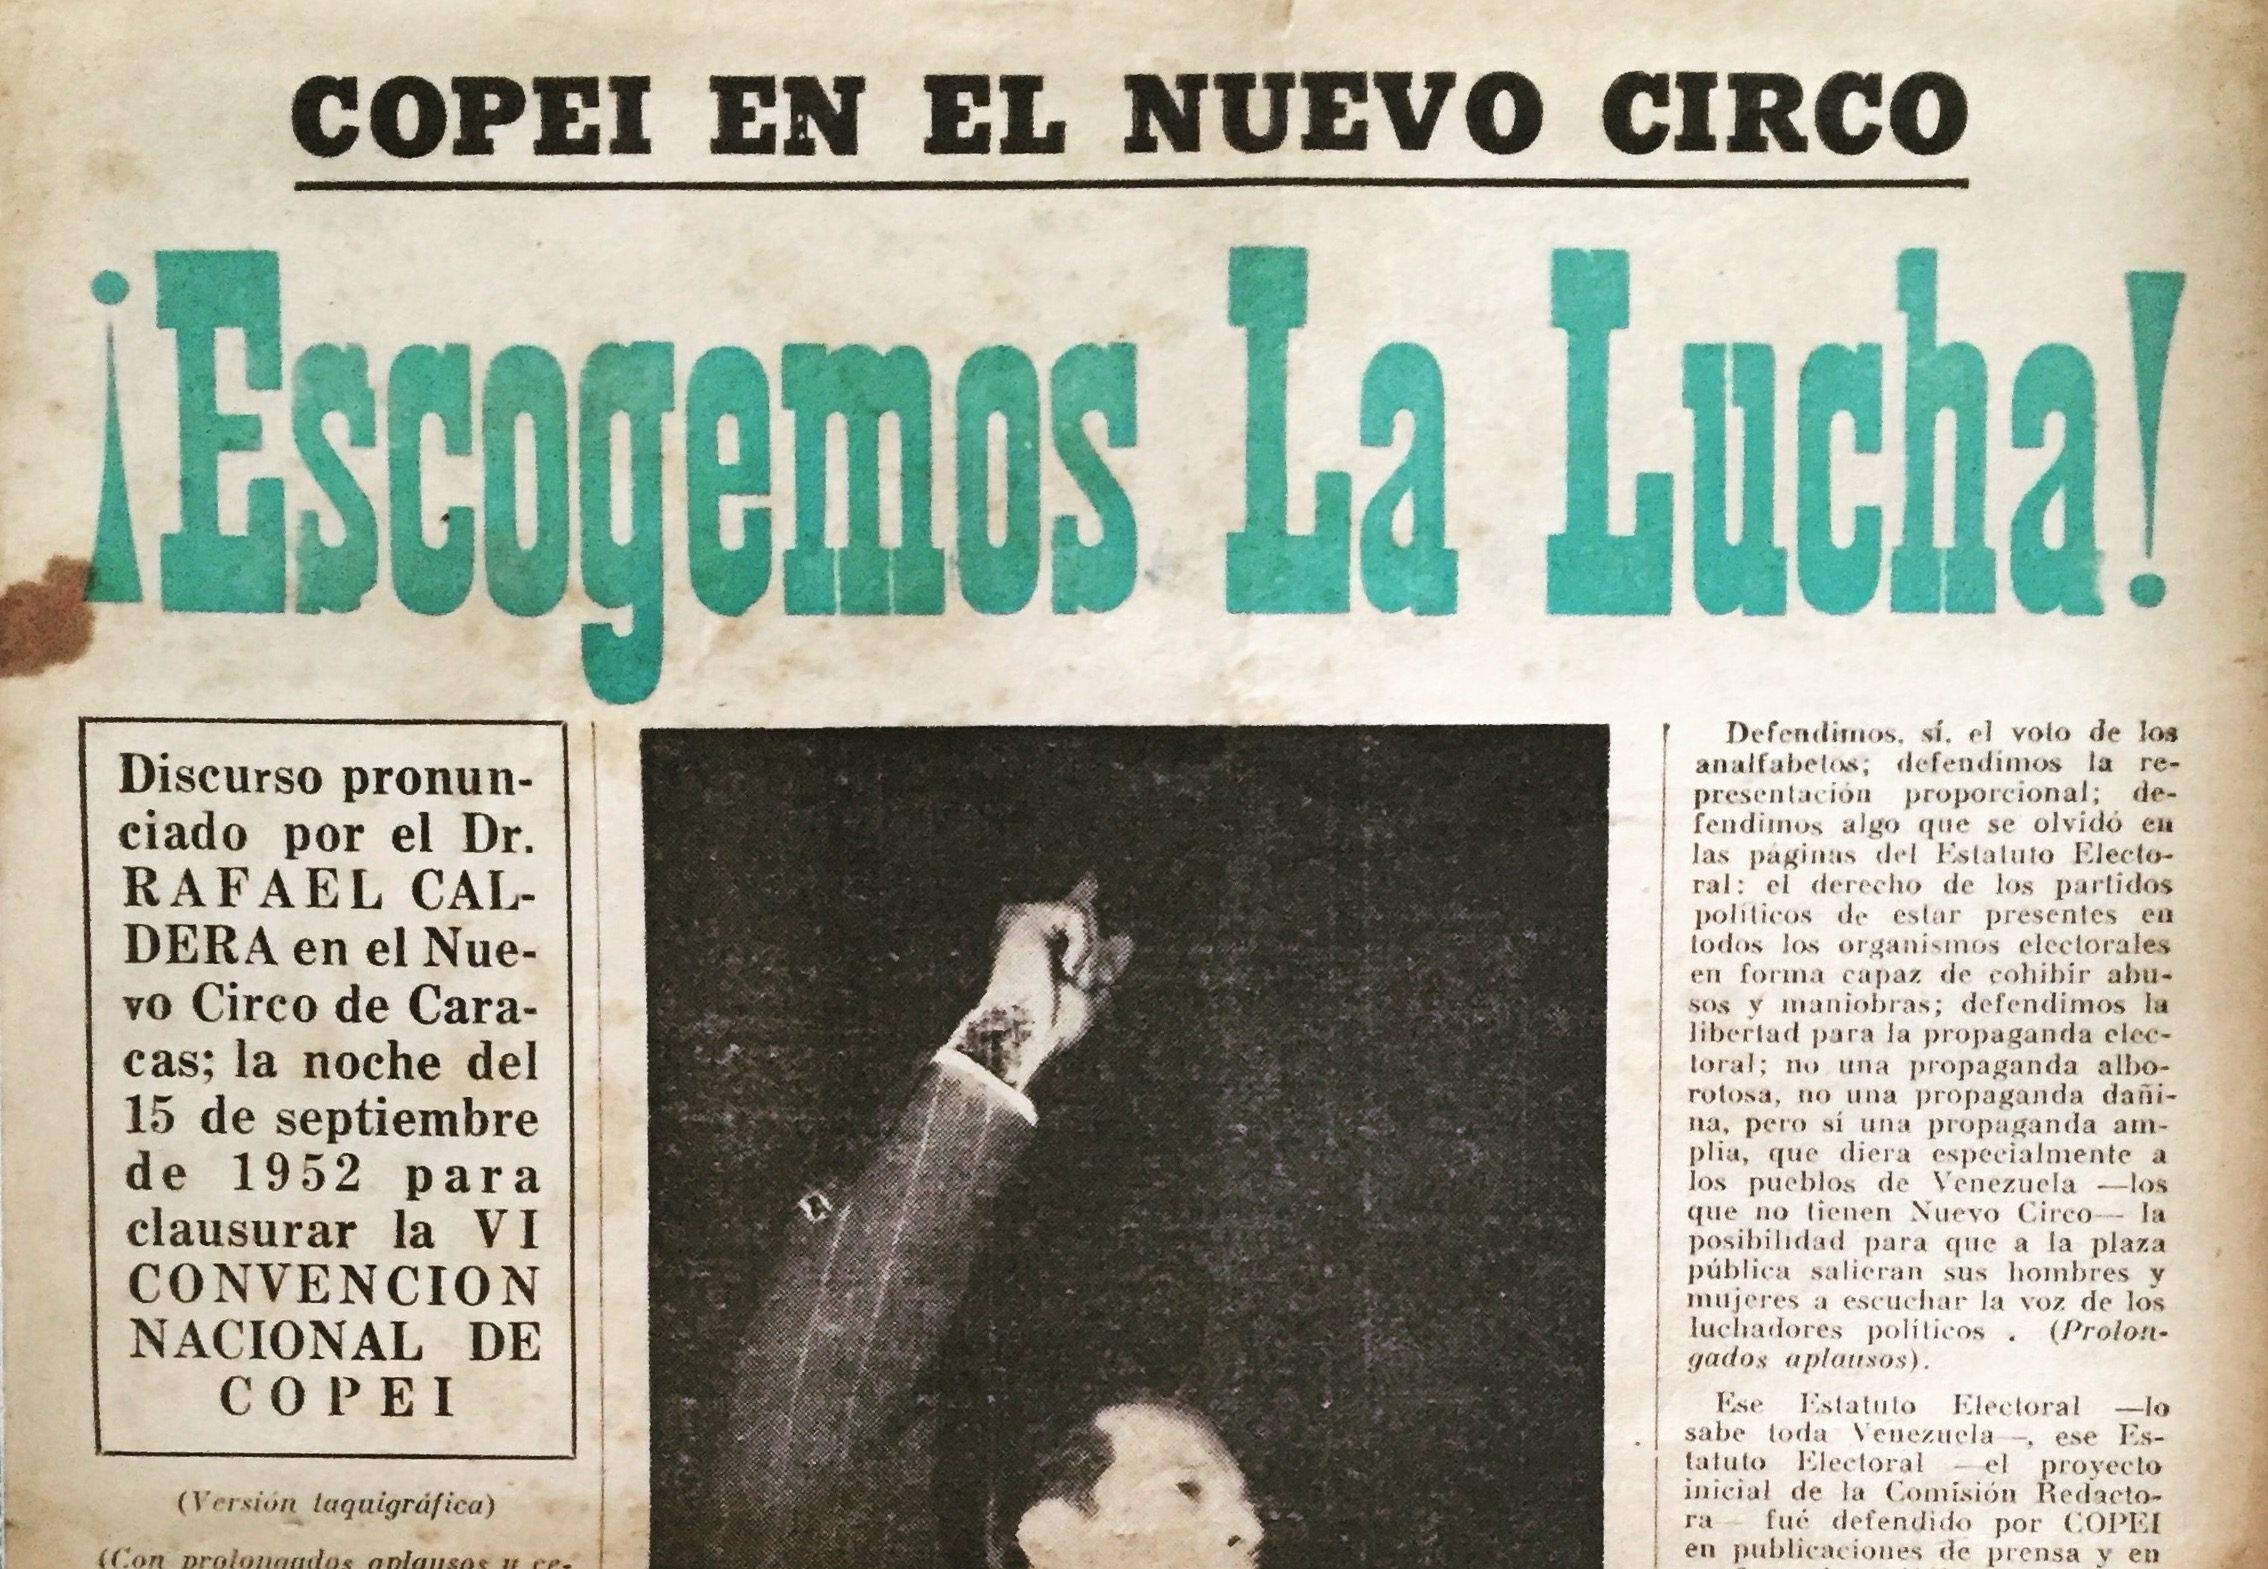 ¡Escogemos la lucha! (1952)